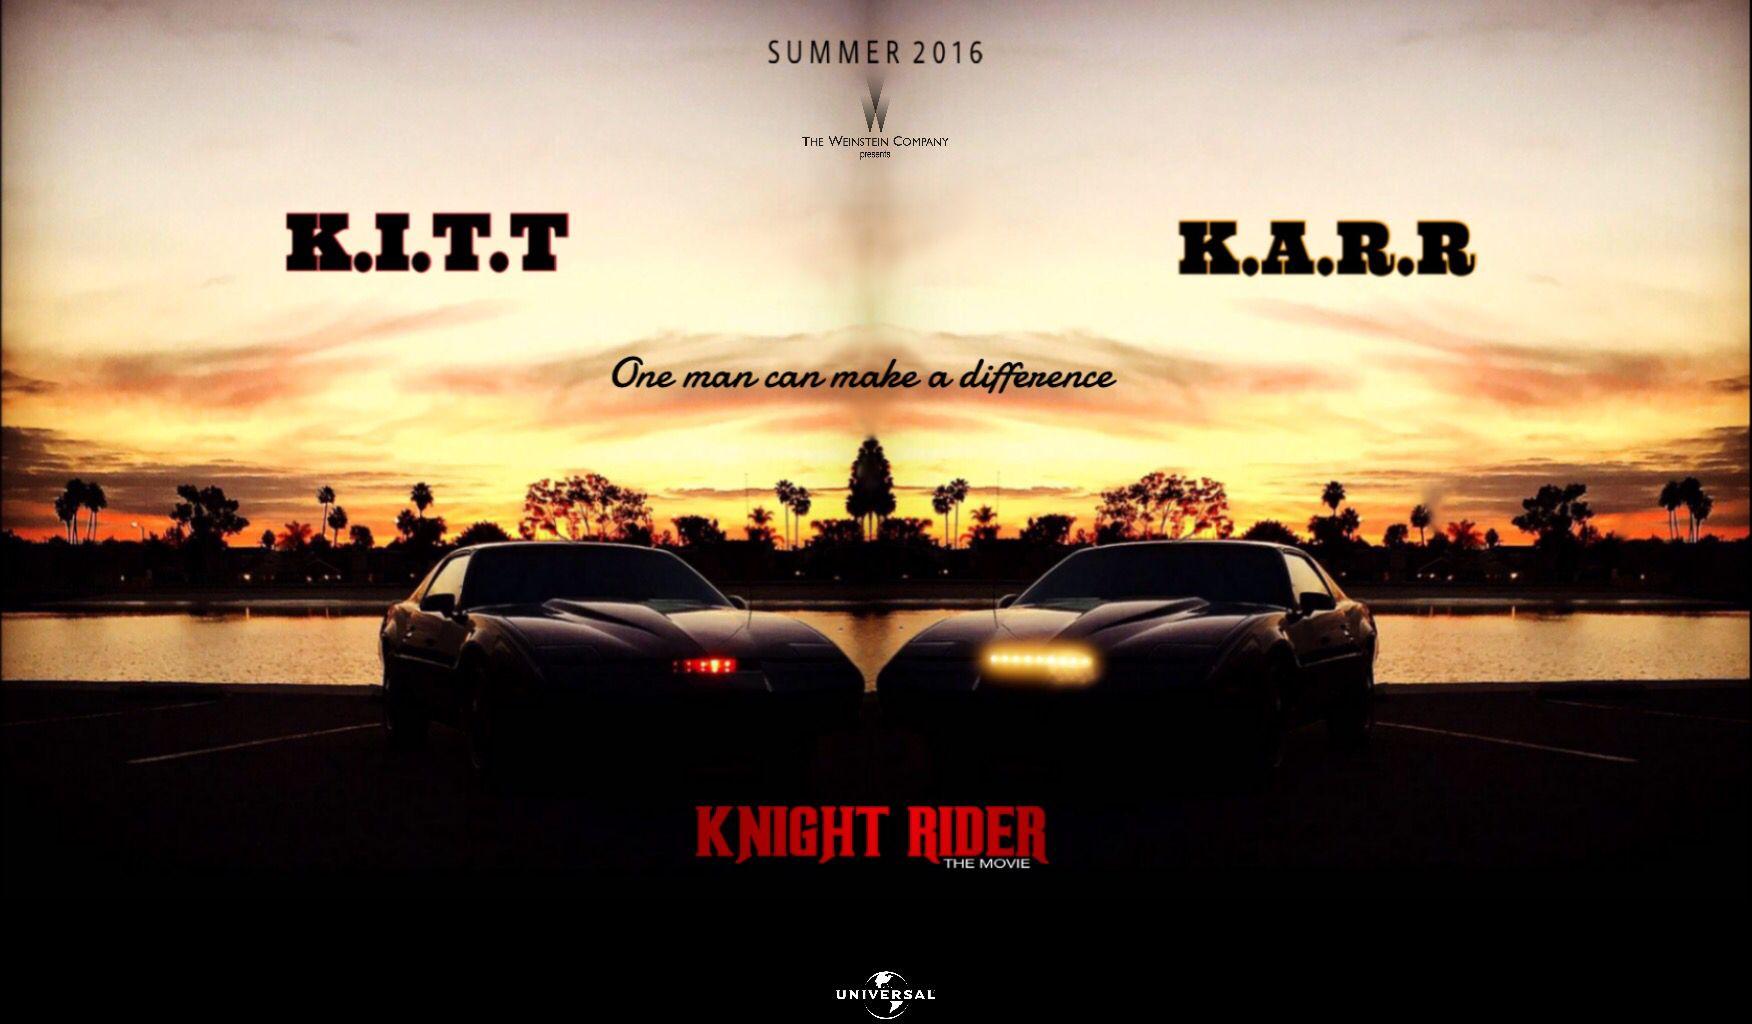 knight rider the movie knight rider movies movie. Black Bedroom Furniture Sets. Home Design Ideas